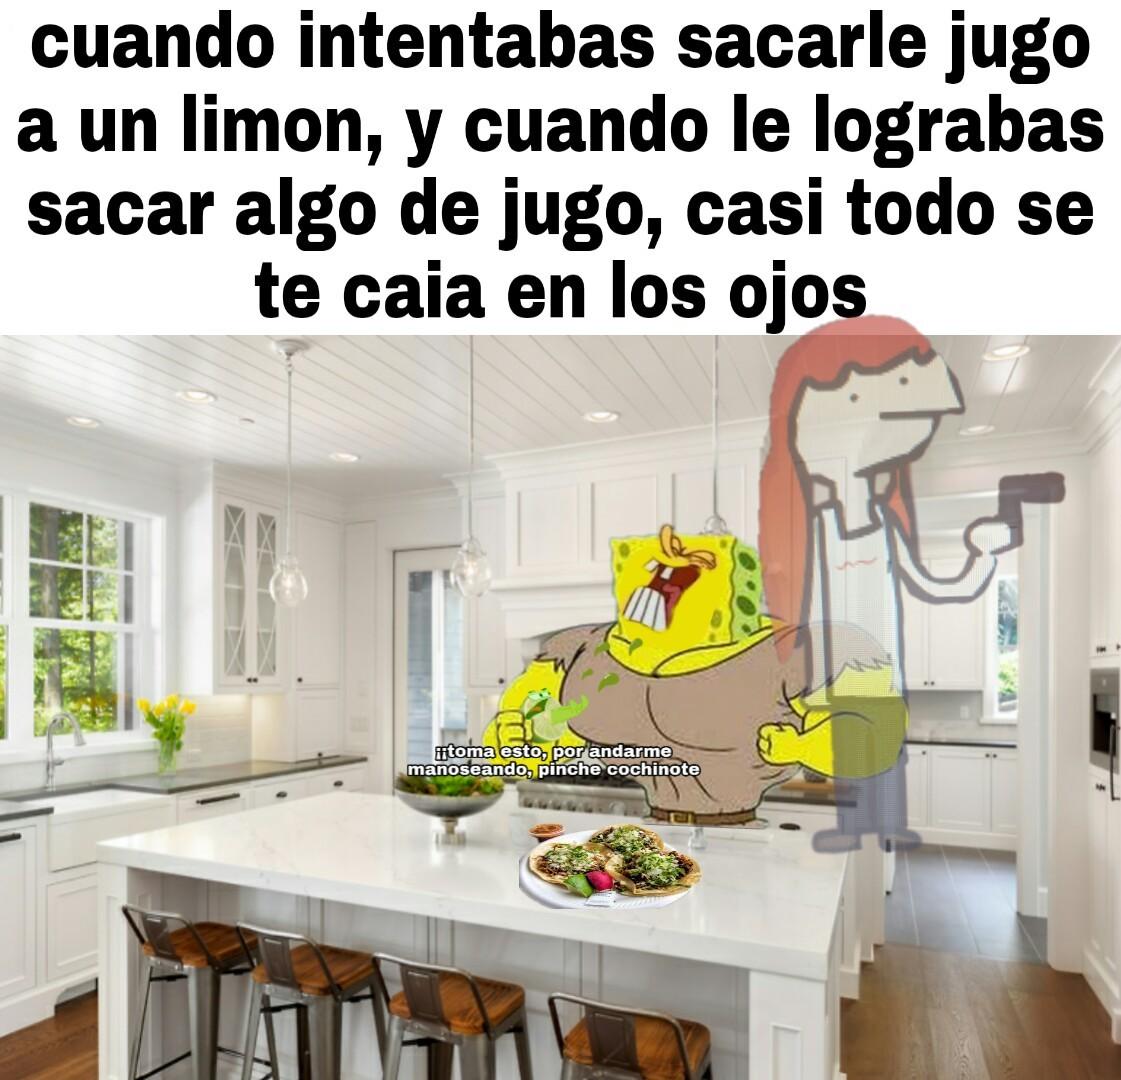 Pinche limon, sacate a la verga :D - meme